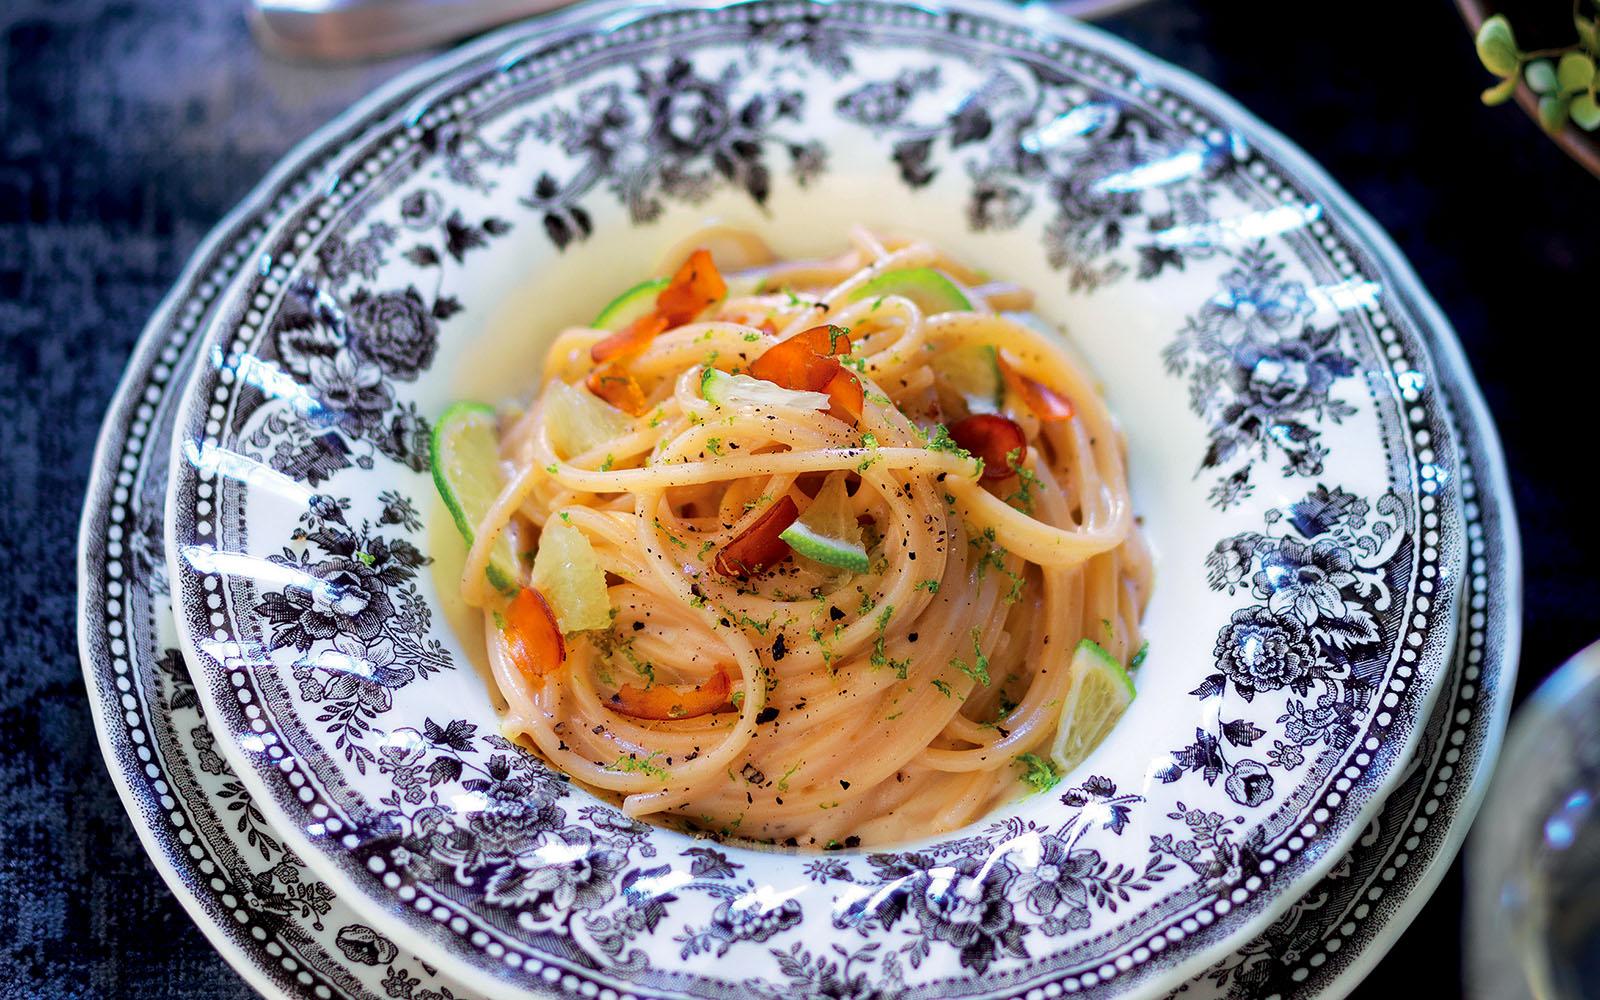 Spaghettoni recipe with cheese, pepper and bottarga